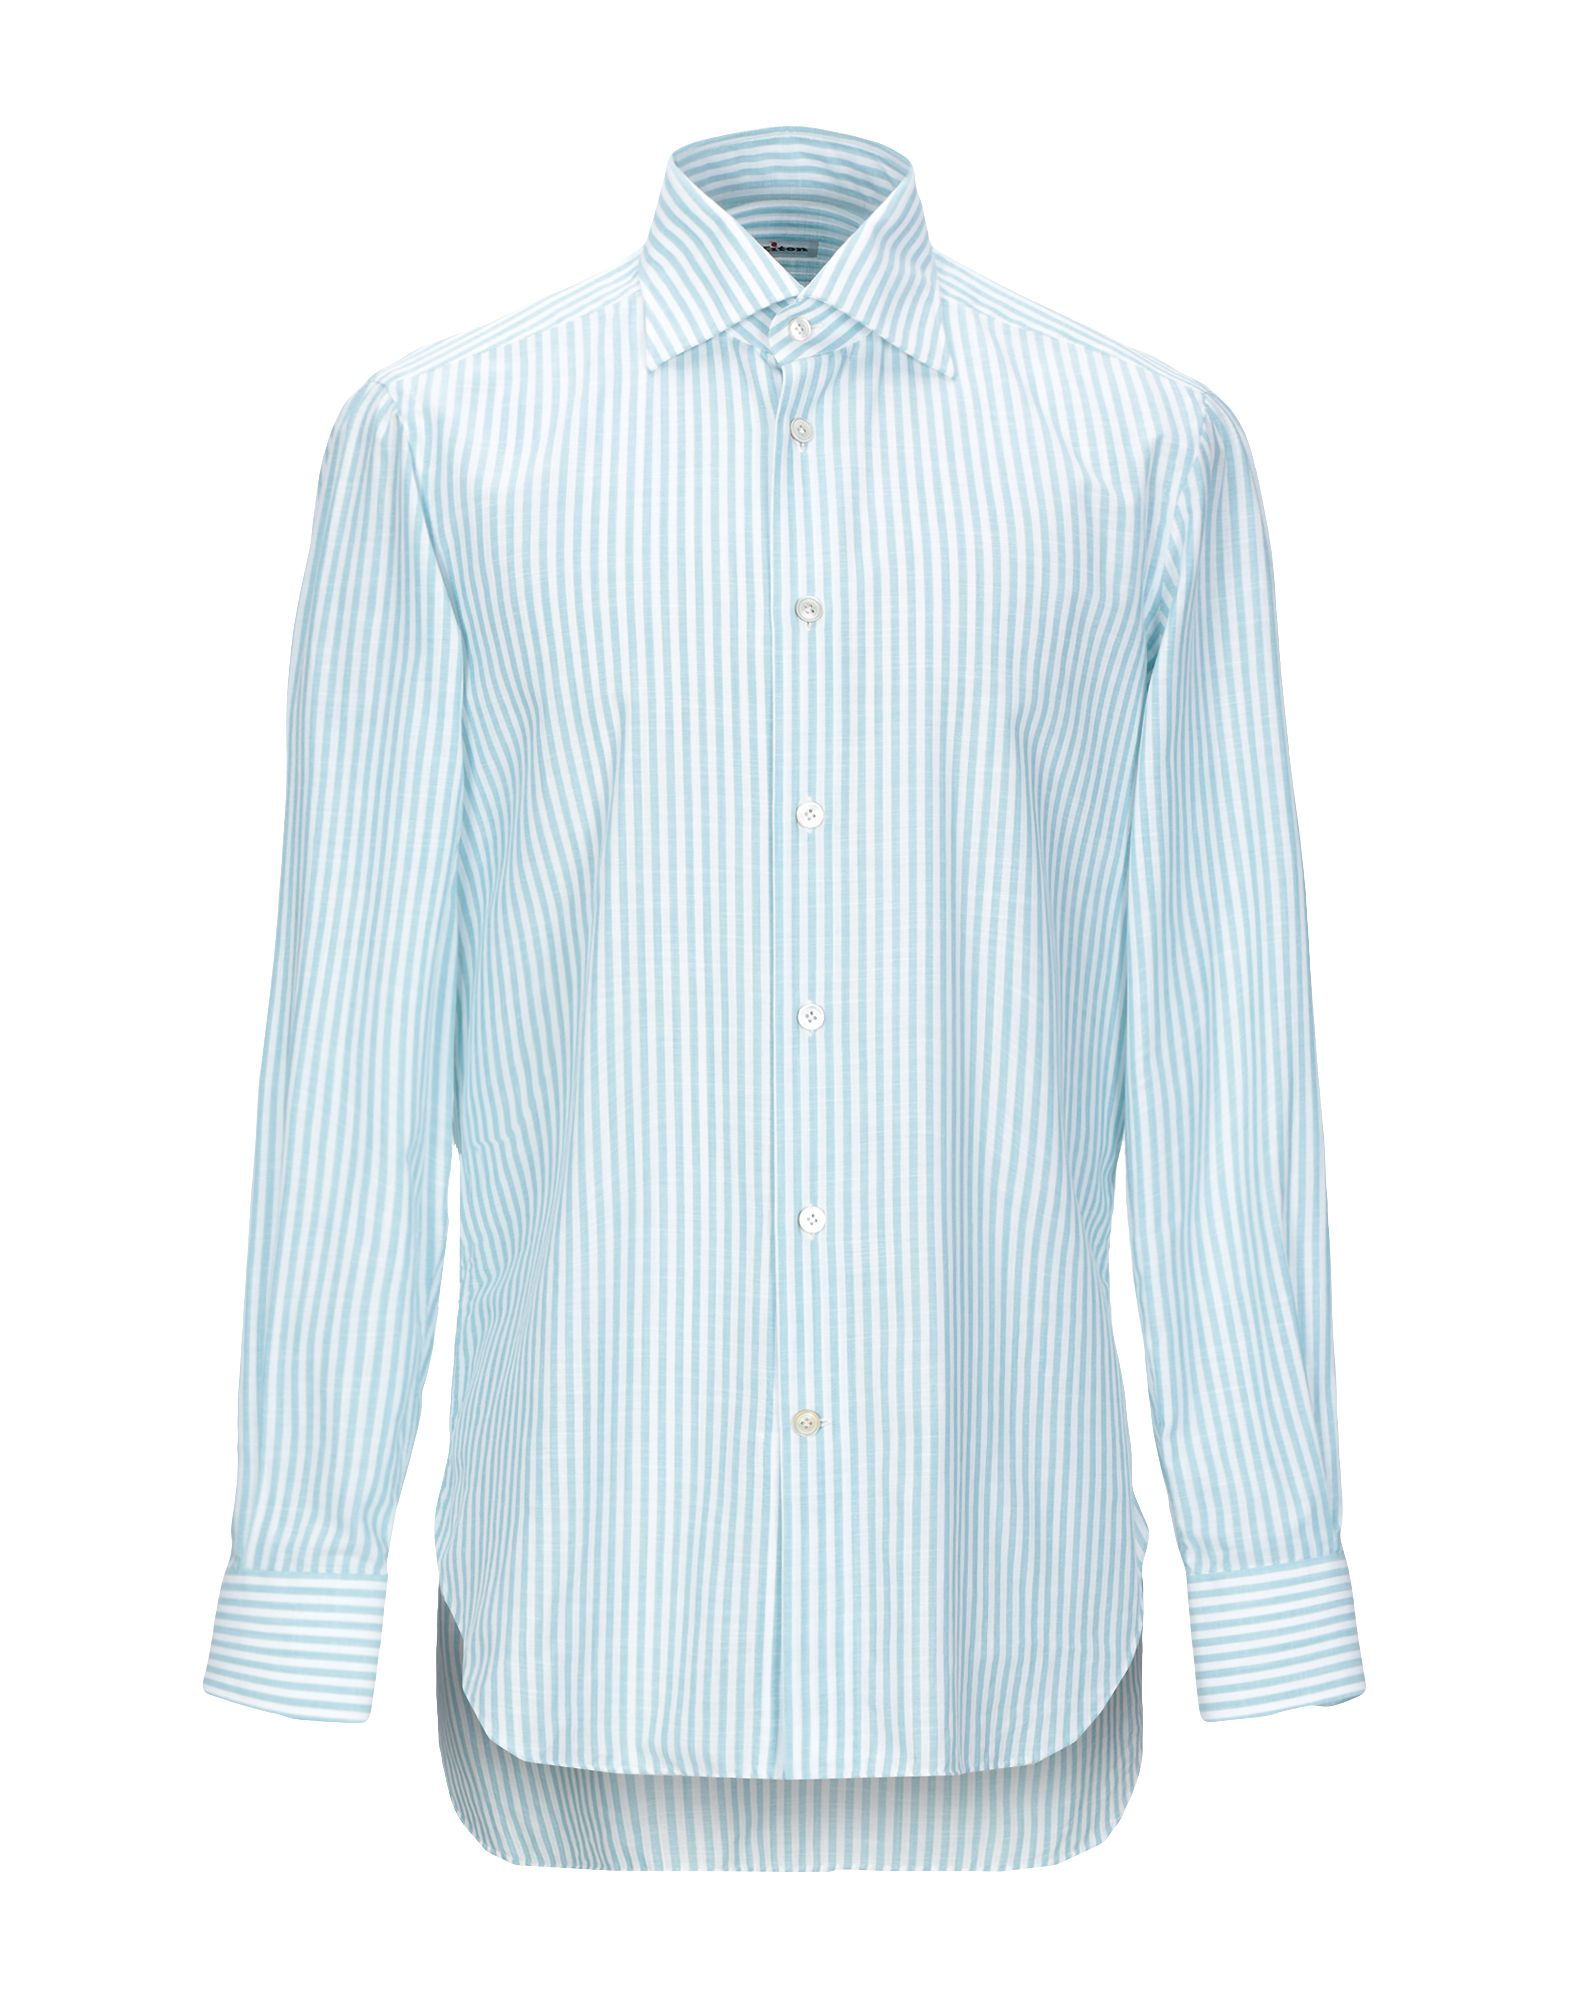 Camicia A Righe Righe Kiton uomo - 38861120PK  Online einkaufen